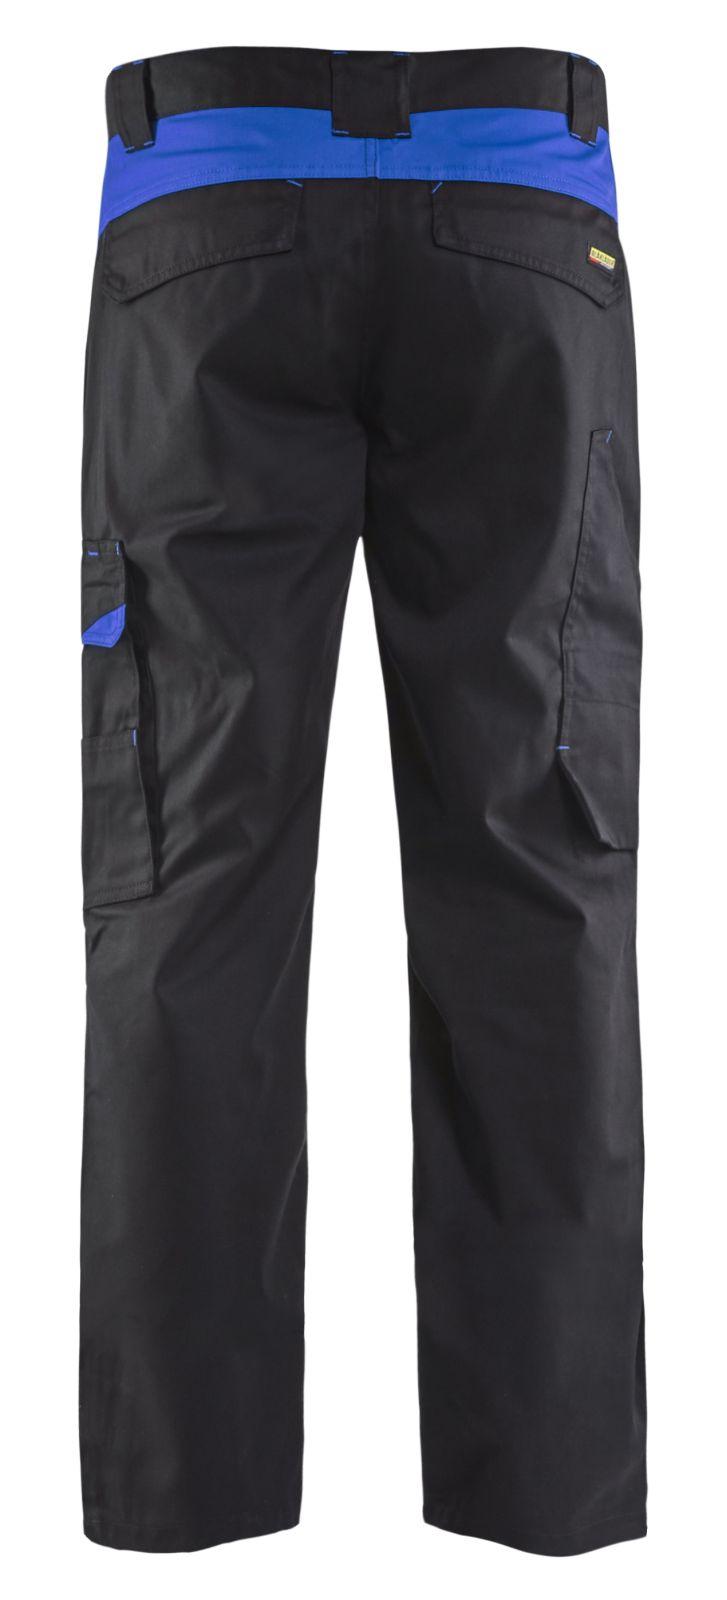 Blaklader Werkbroeken 14041800 zwart-korenblauw(9985)